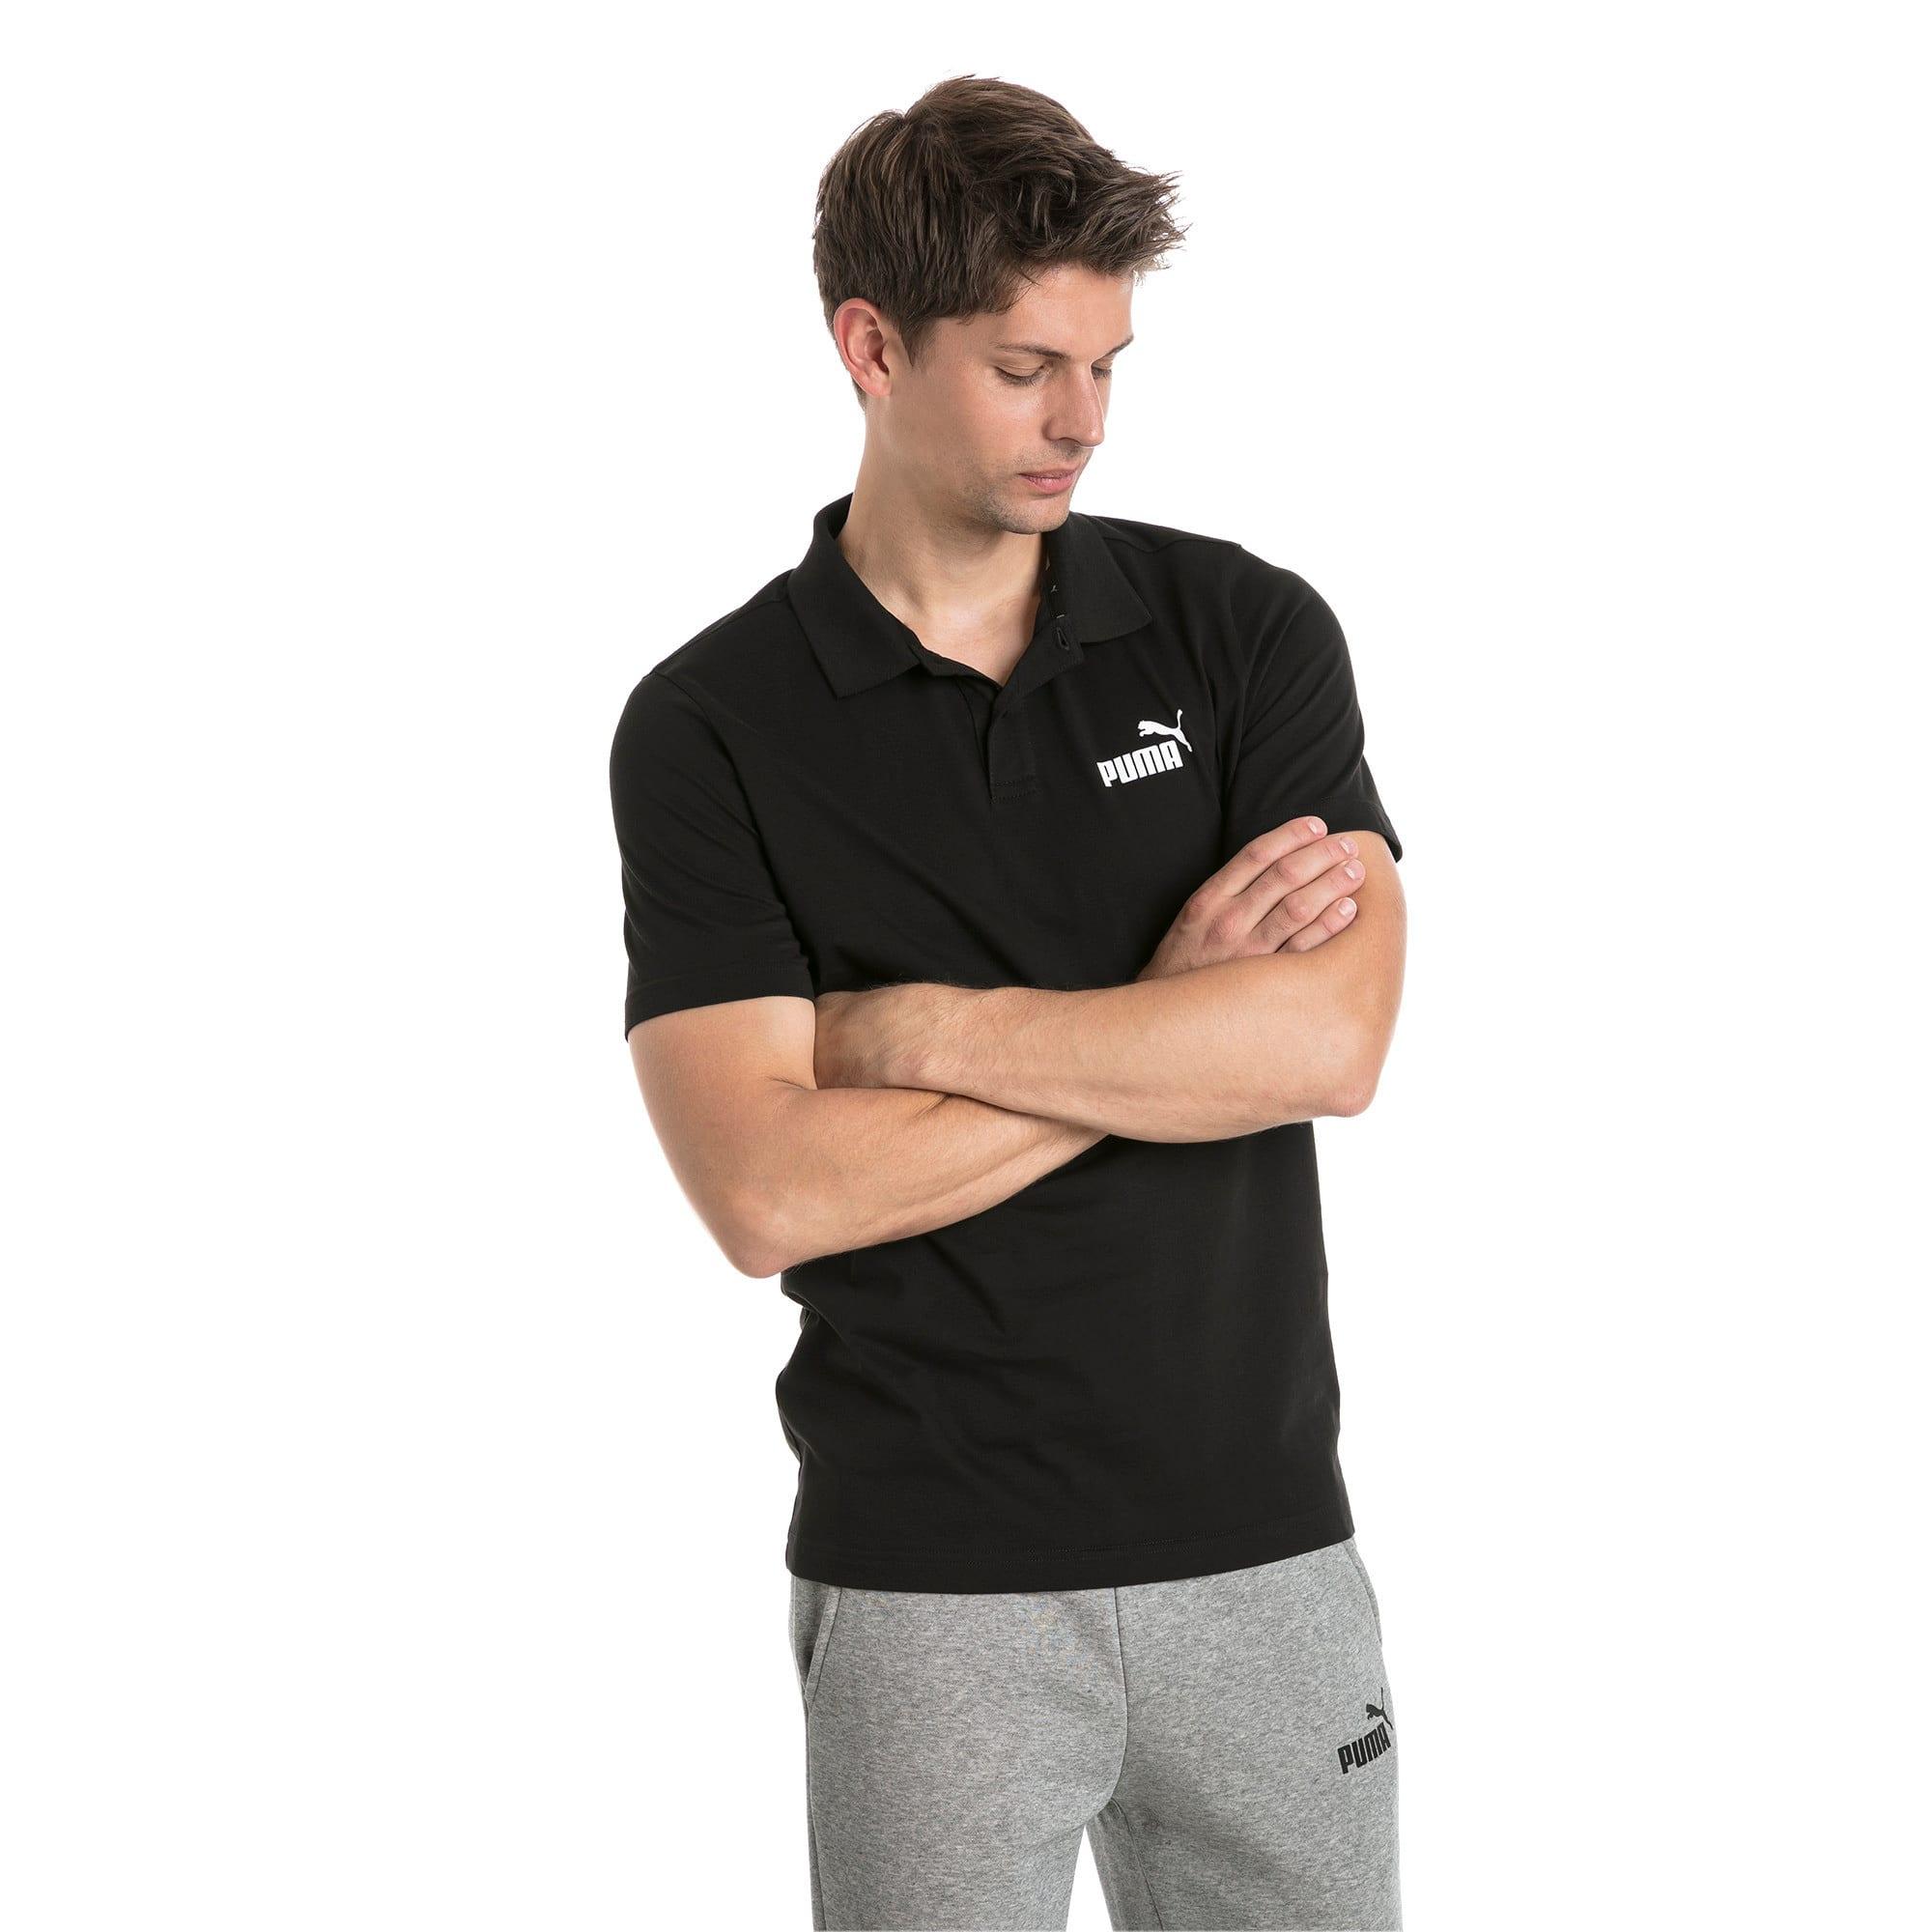 Thumbnail 1 of Polo in jersey Essentials uomo, Cotton Black, medium